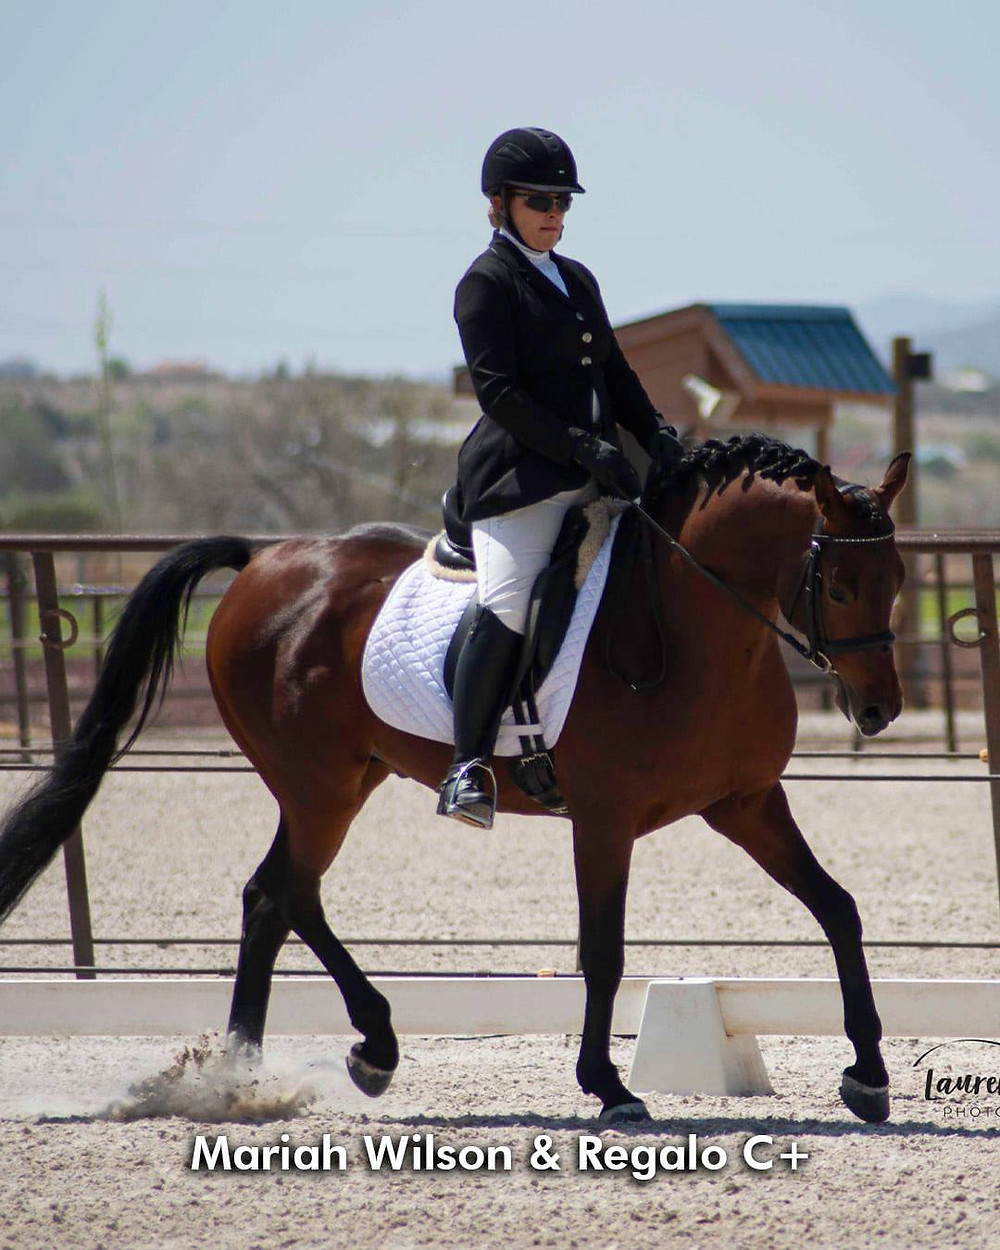 Arabian trainer Mariah Wilson dressage at HIPICO Santa Fe